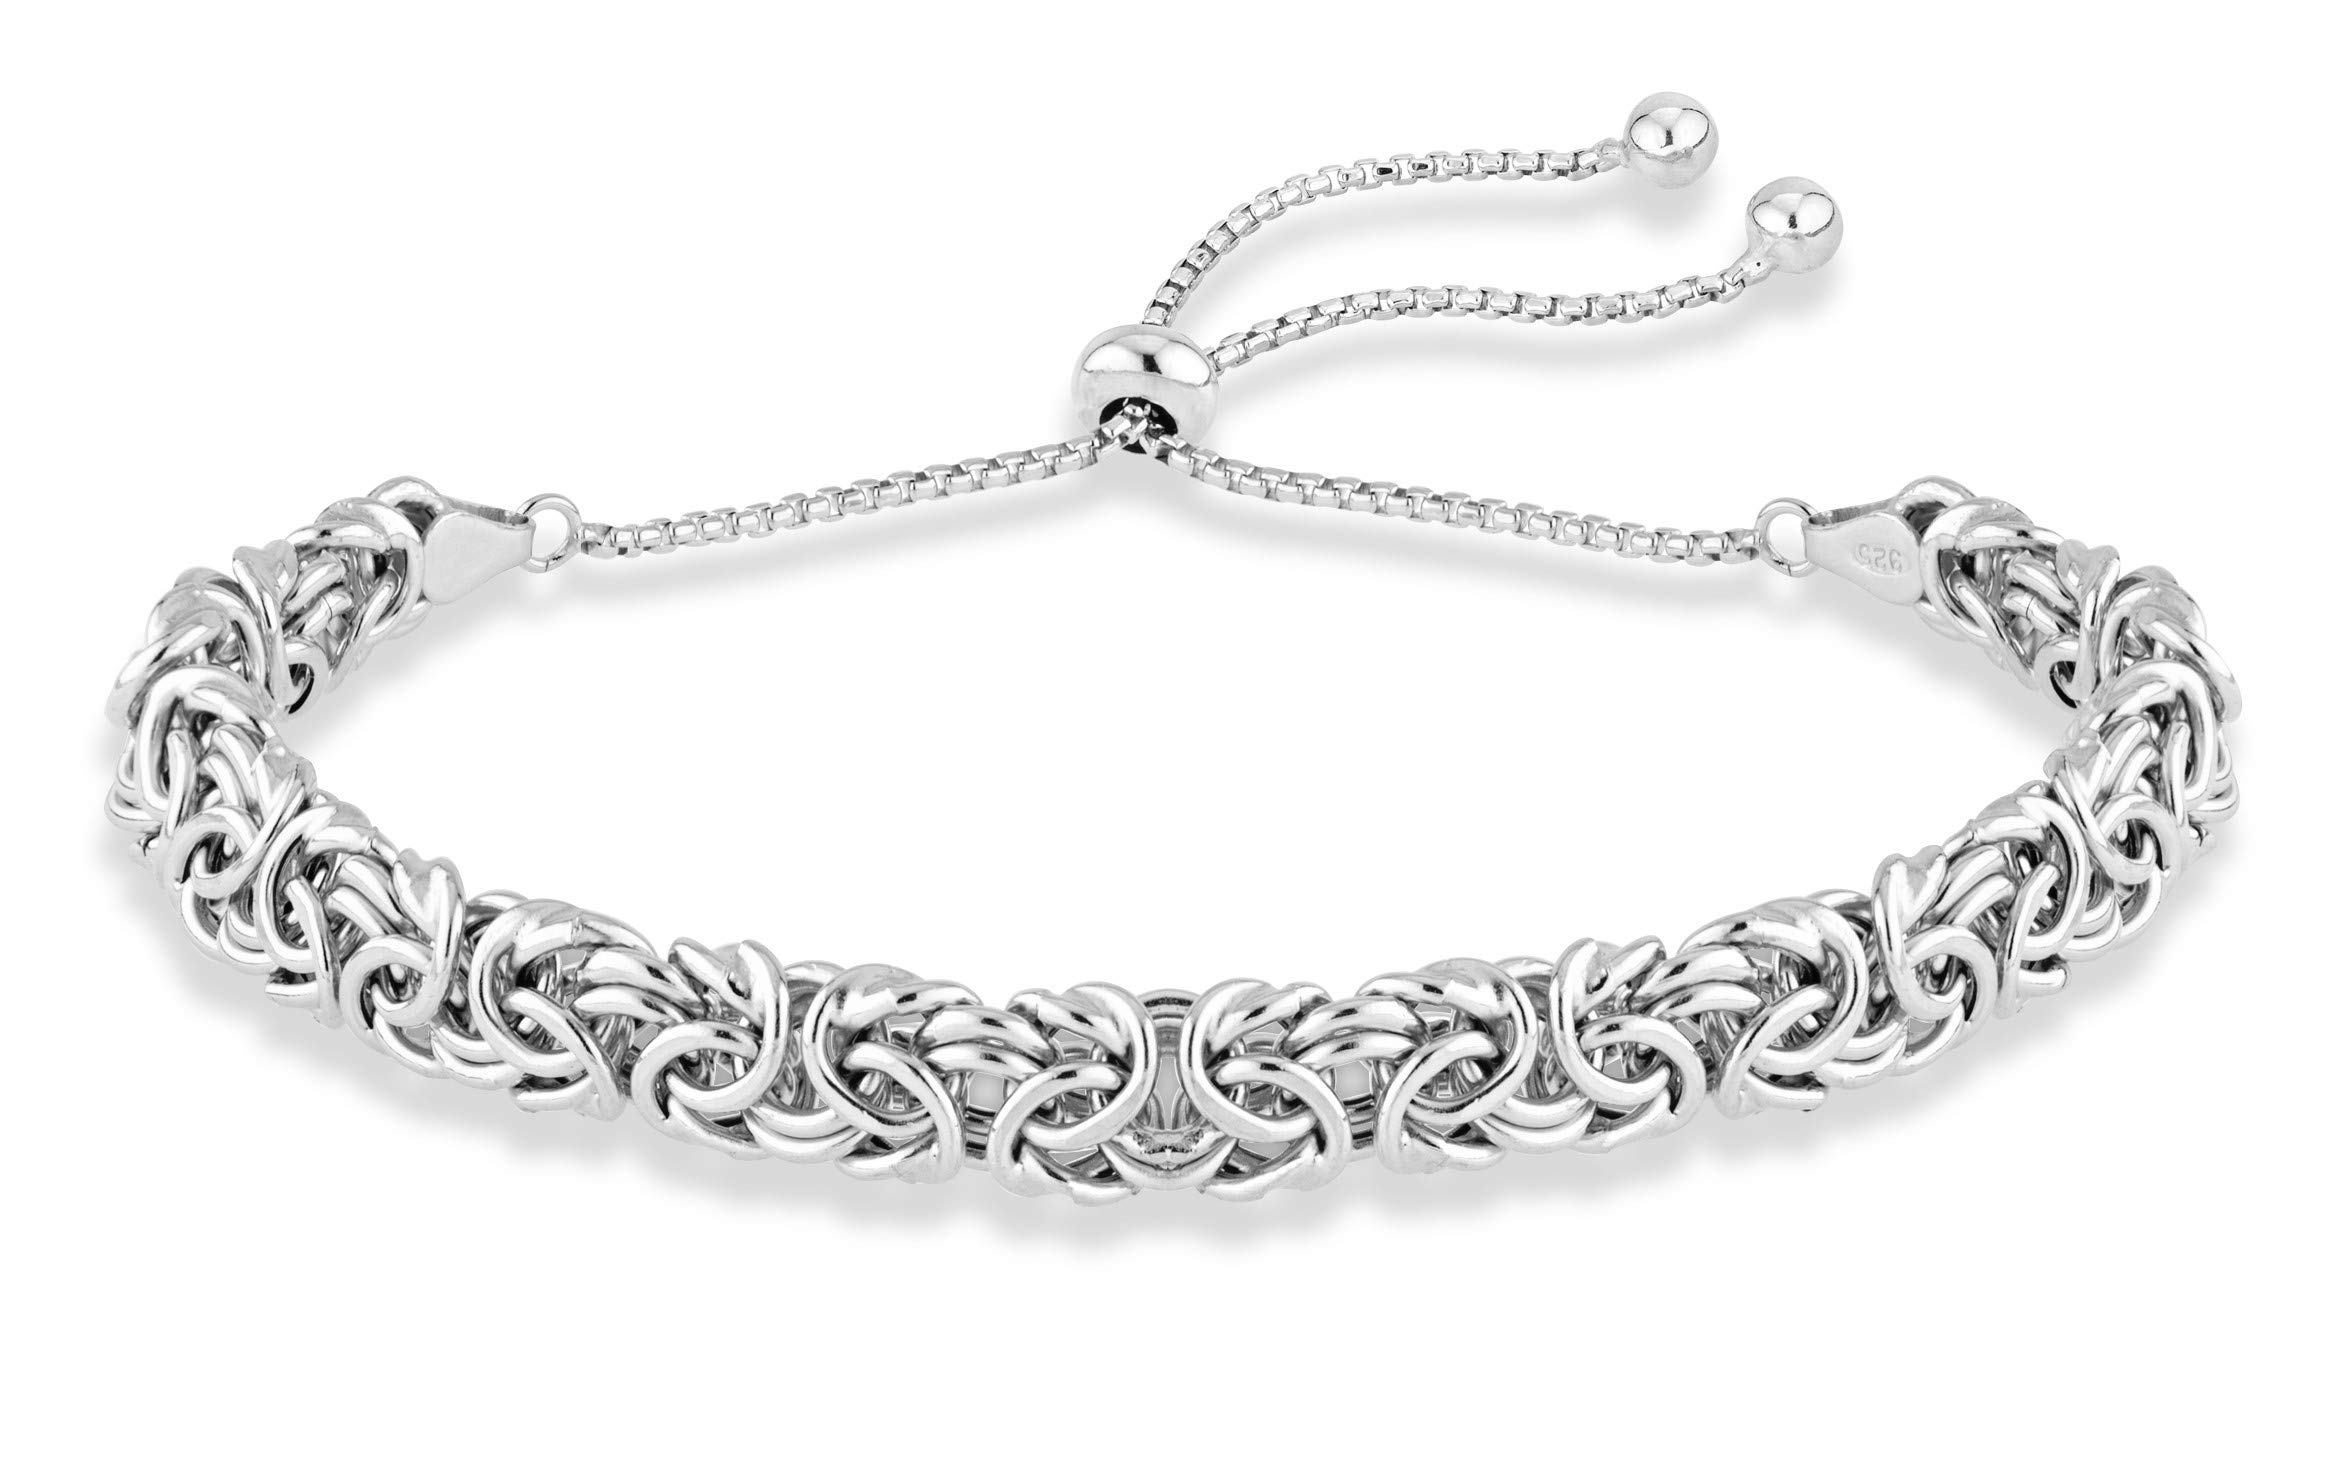 MiaBella 925 Sterling Silver Italian Byzantine Adjustable Bolo Link Chain Bracelet for Women Handmade in Italy by MiaBella